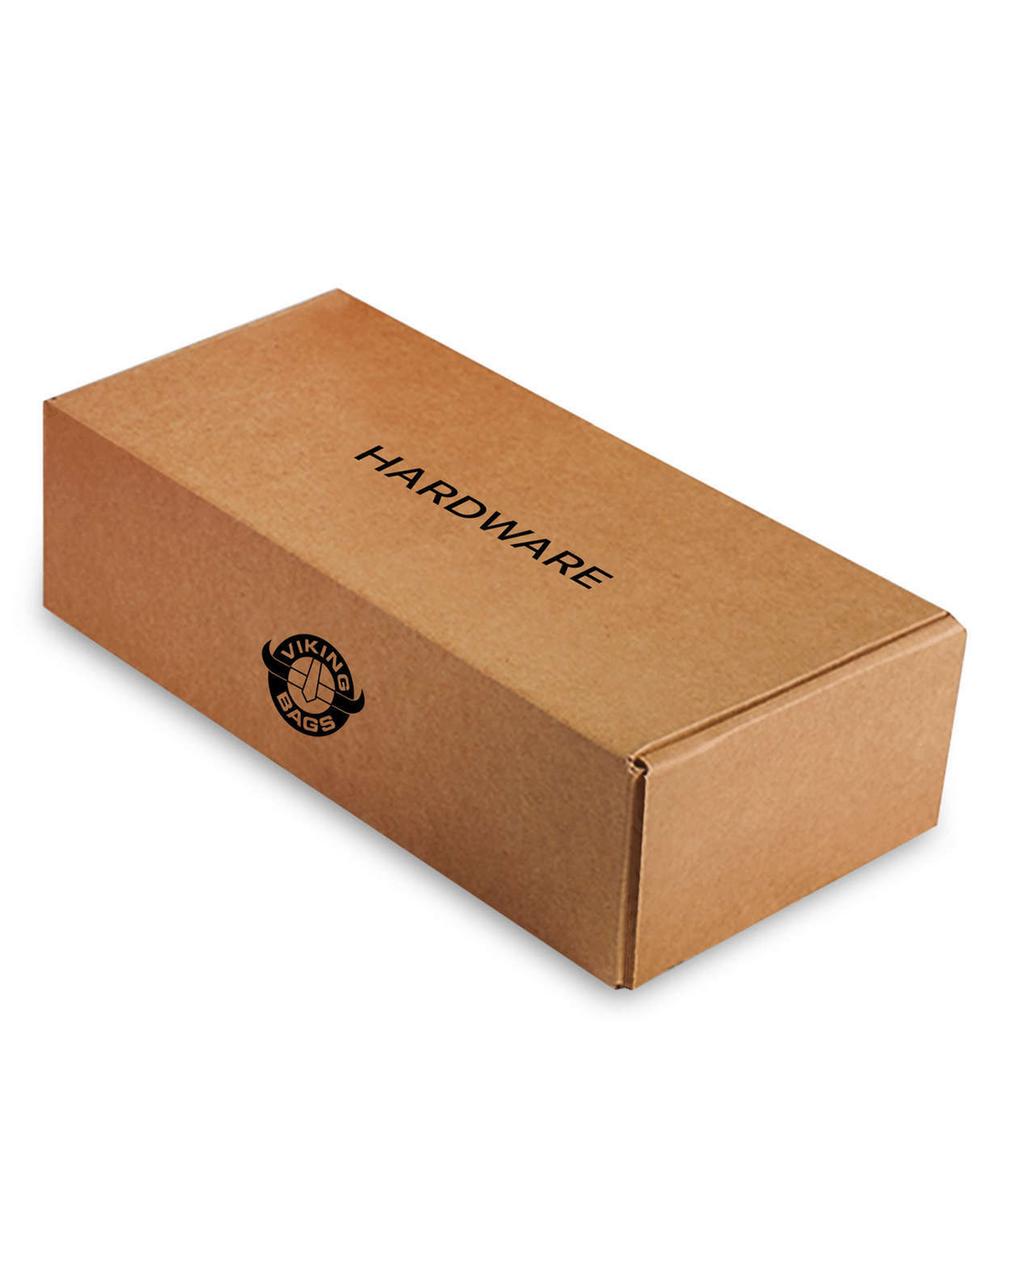 Honda VTX 1800 N Trianon Studded Leather Motorcycle Saddlebags Box